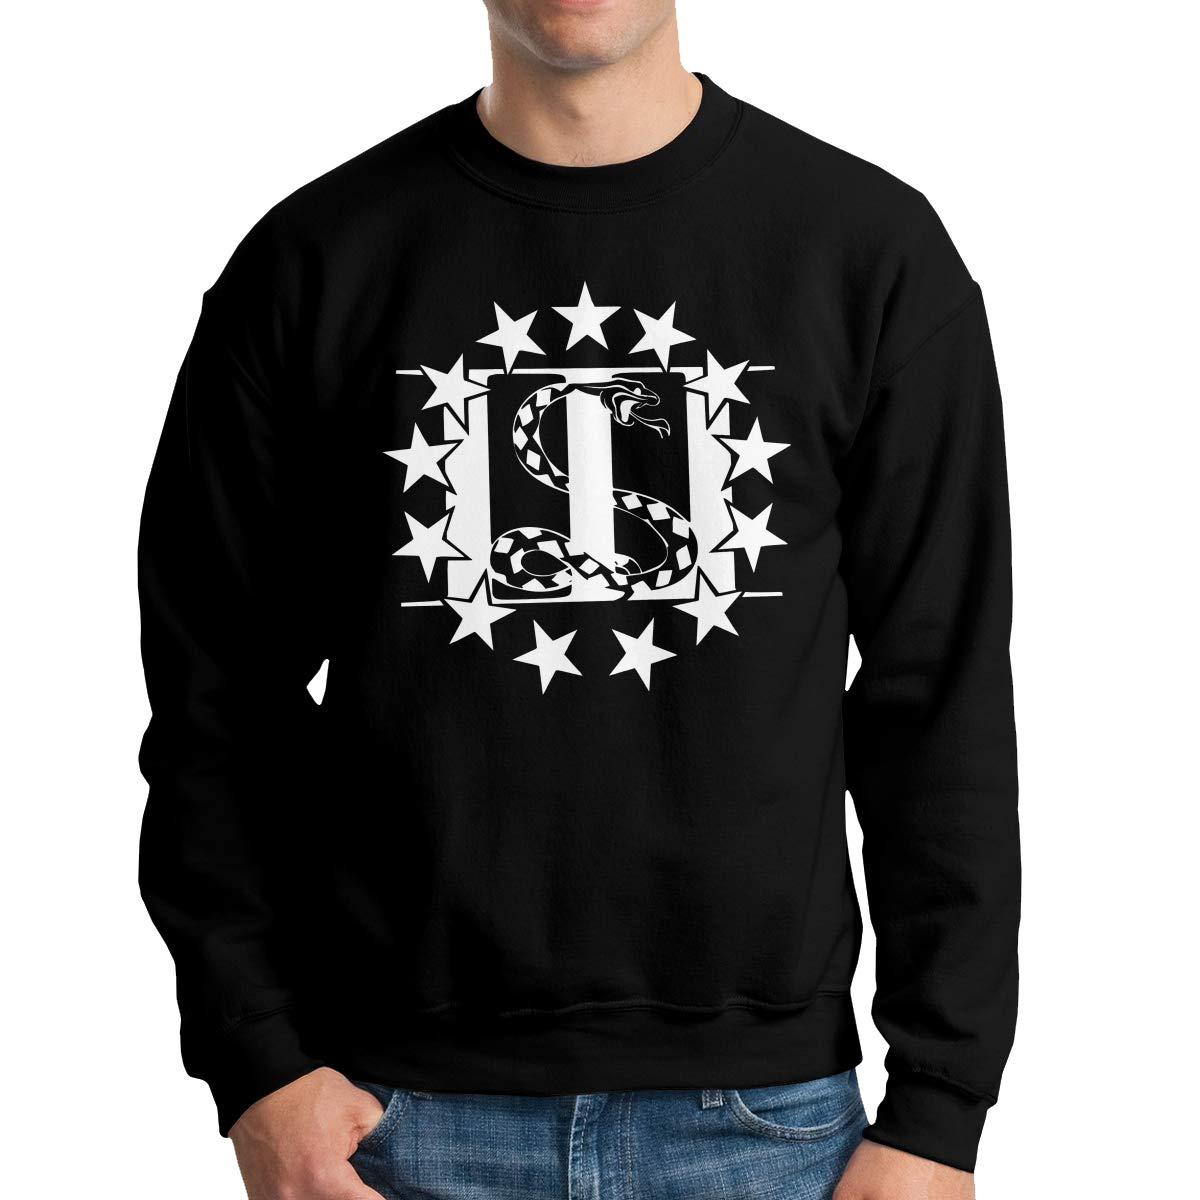 8cb7f4c835e79c Black The Three Percenters Dont Tread On MeMen's Long Long Long Sleeve  T-Shirt 561f97